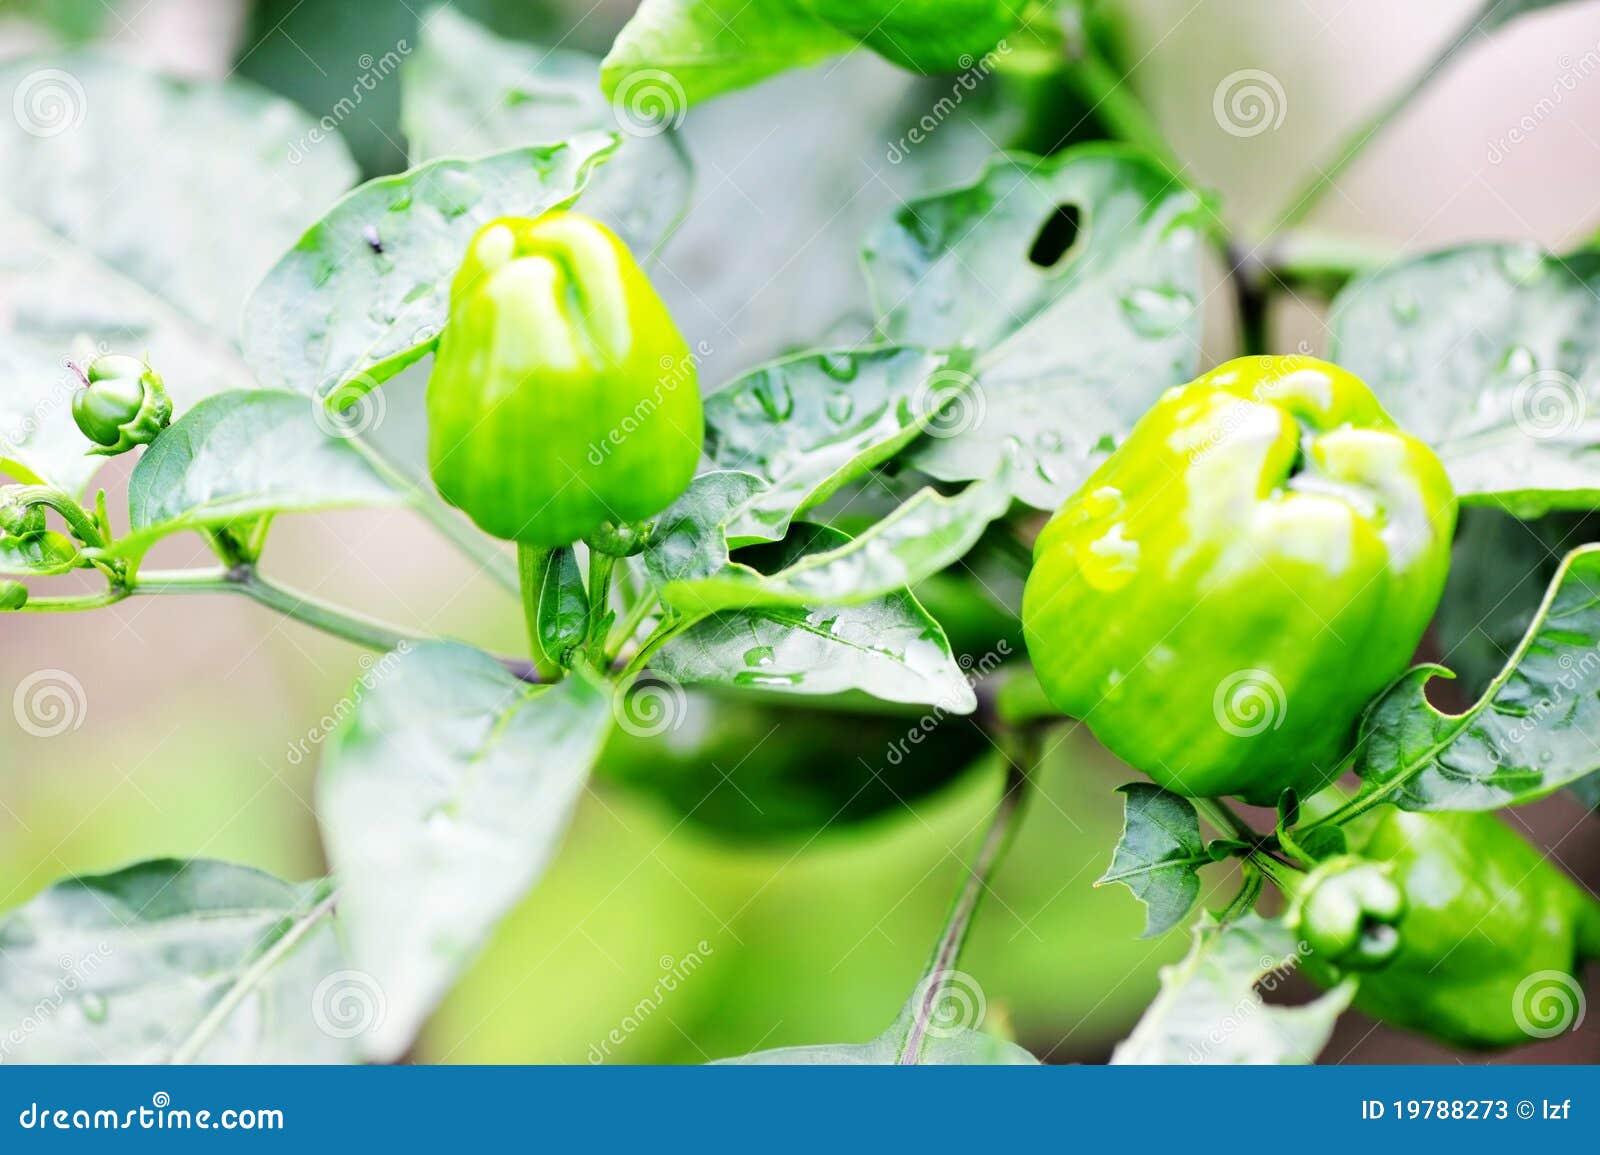 Green Pepper Tree Stock Photos - Image: 19788273